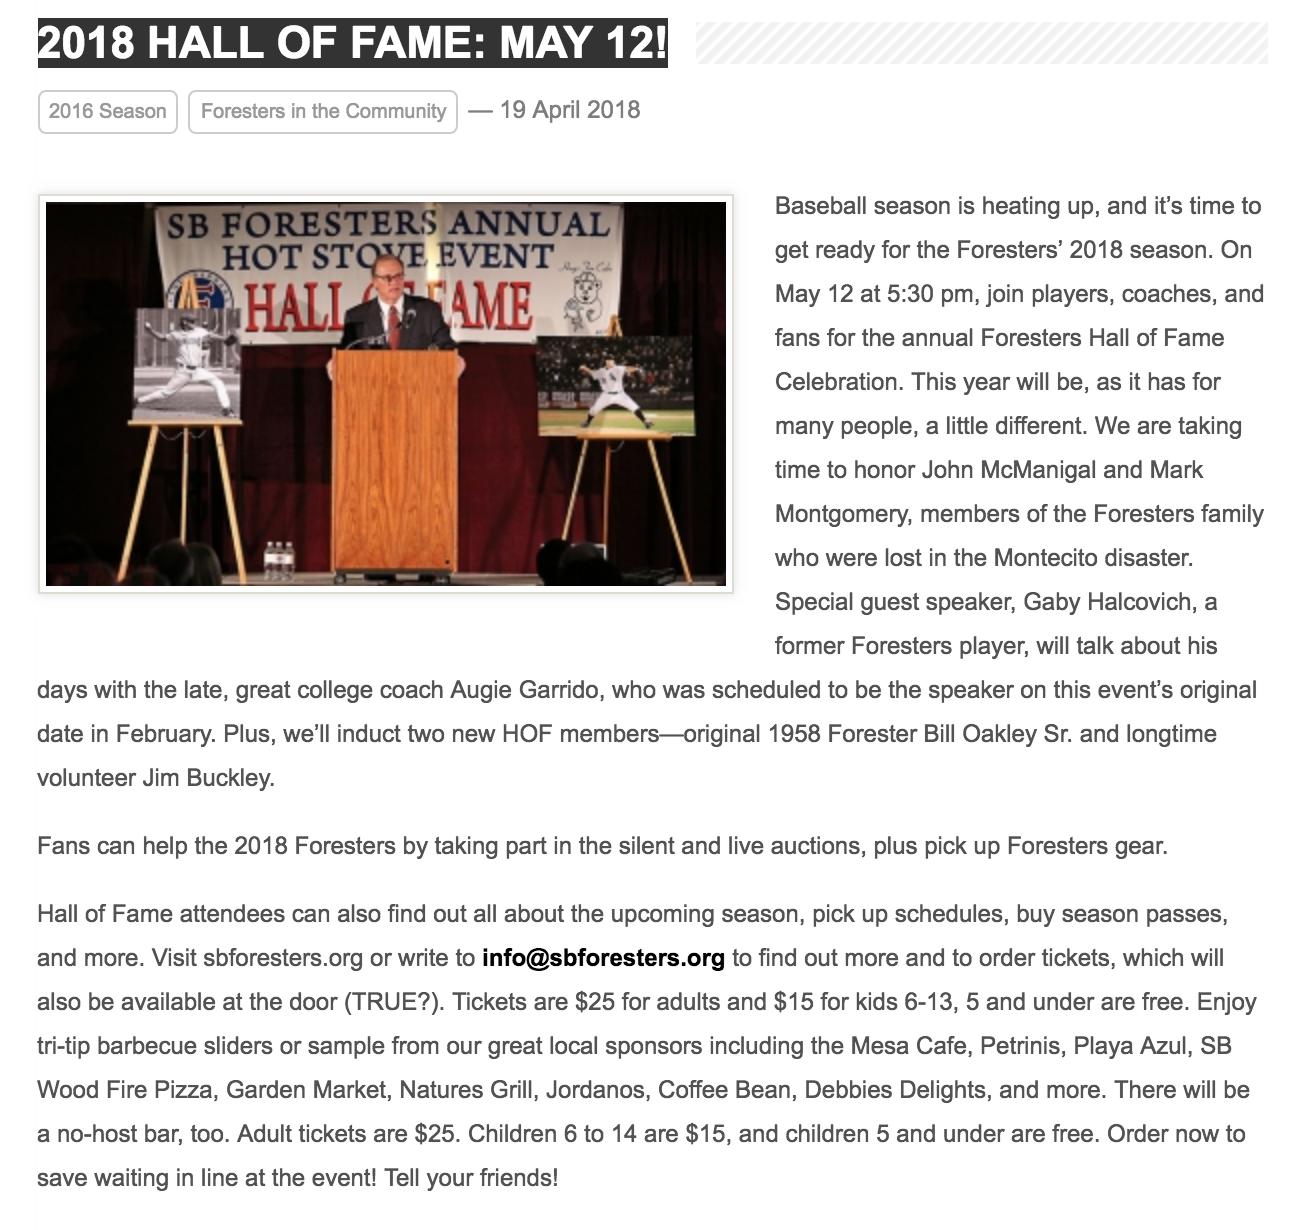 SB Foresters Hall of Fame Celebration